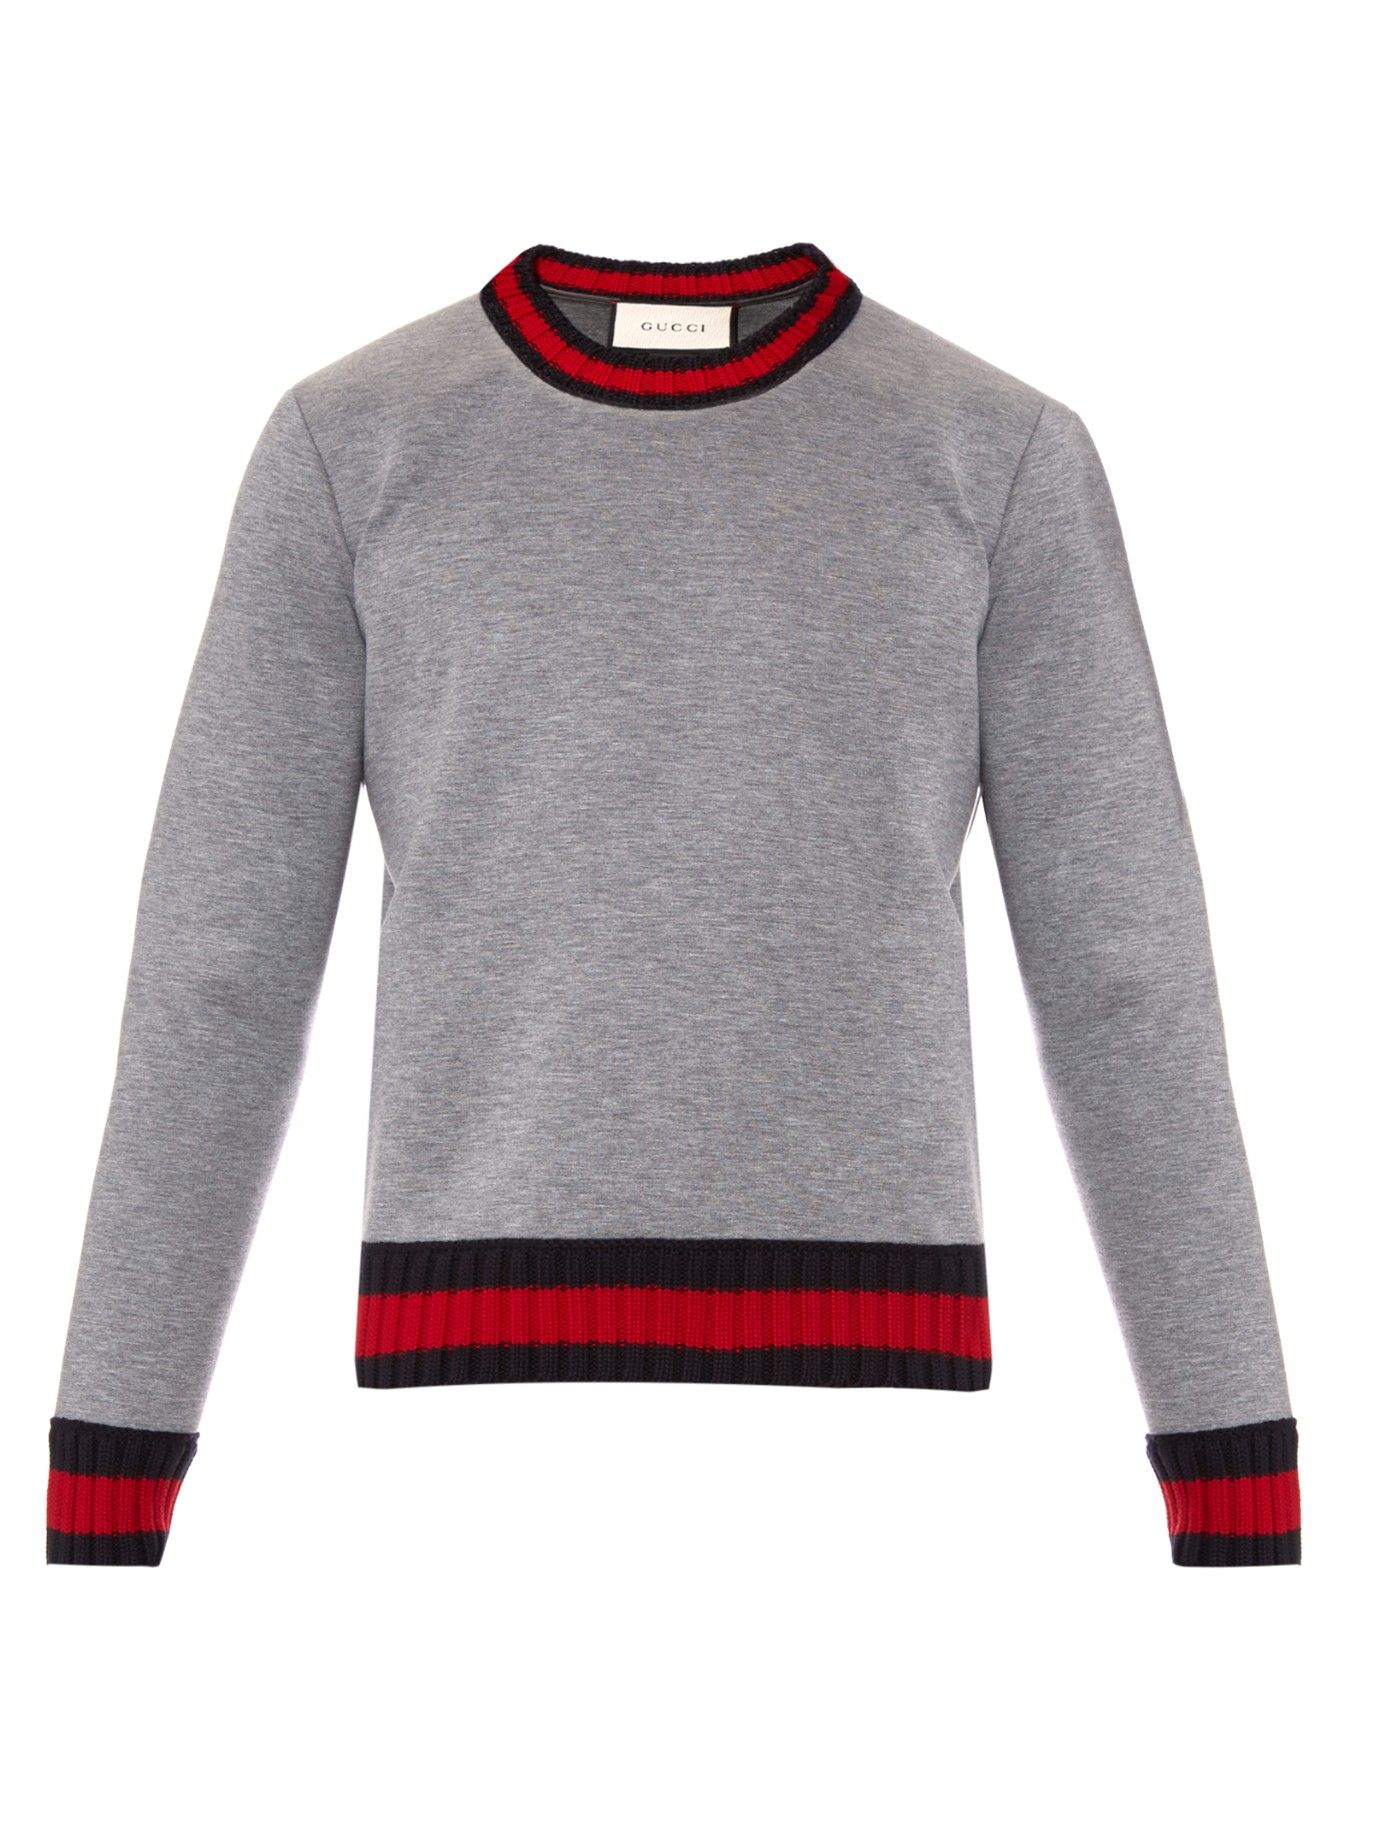 91be197be4b Crew-neck neoprene sweatshirt